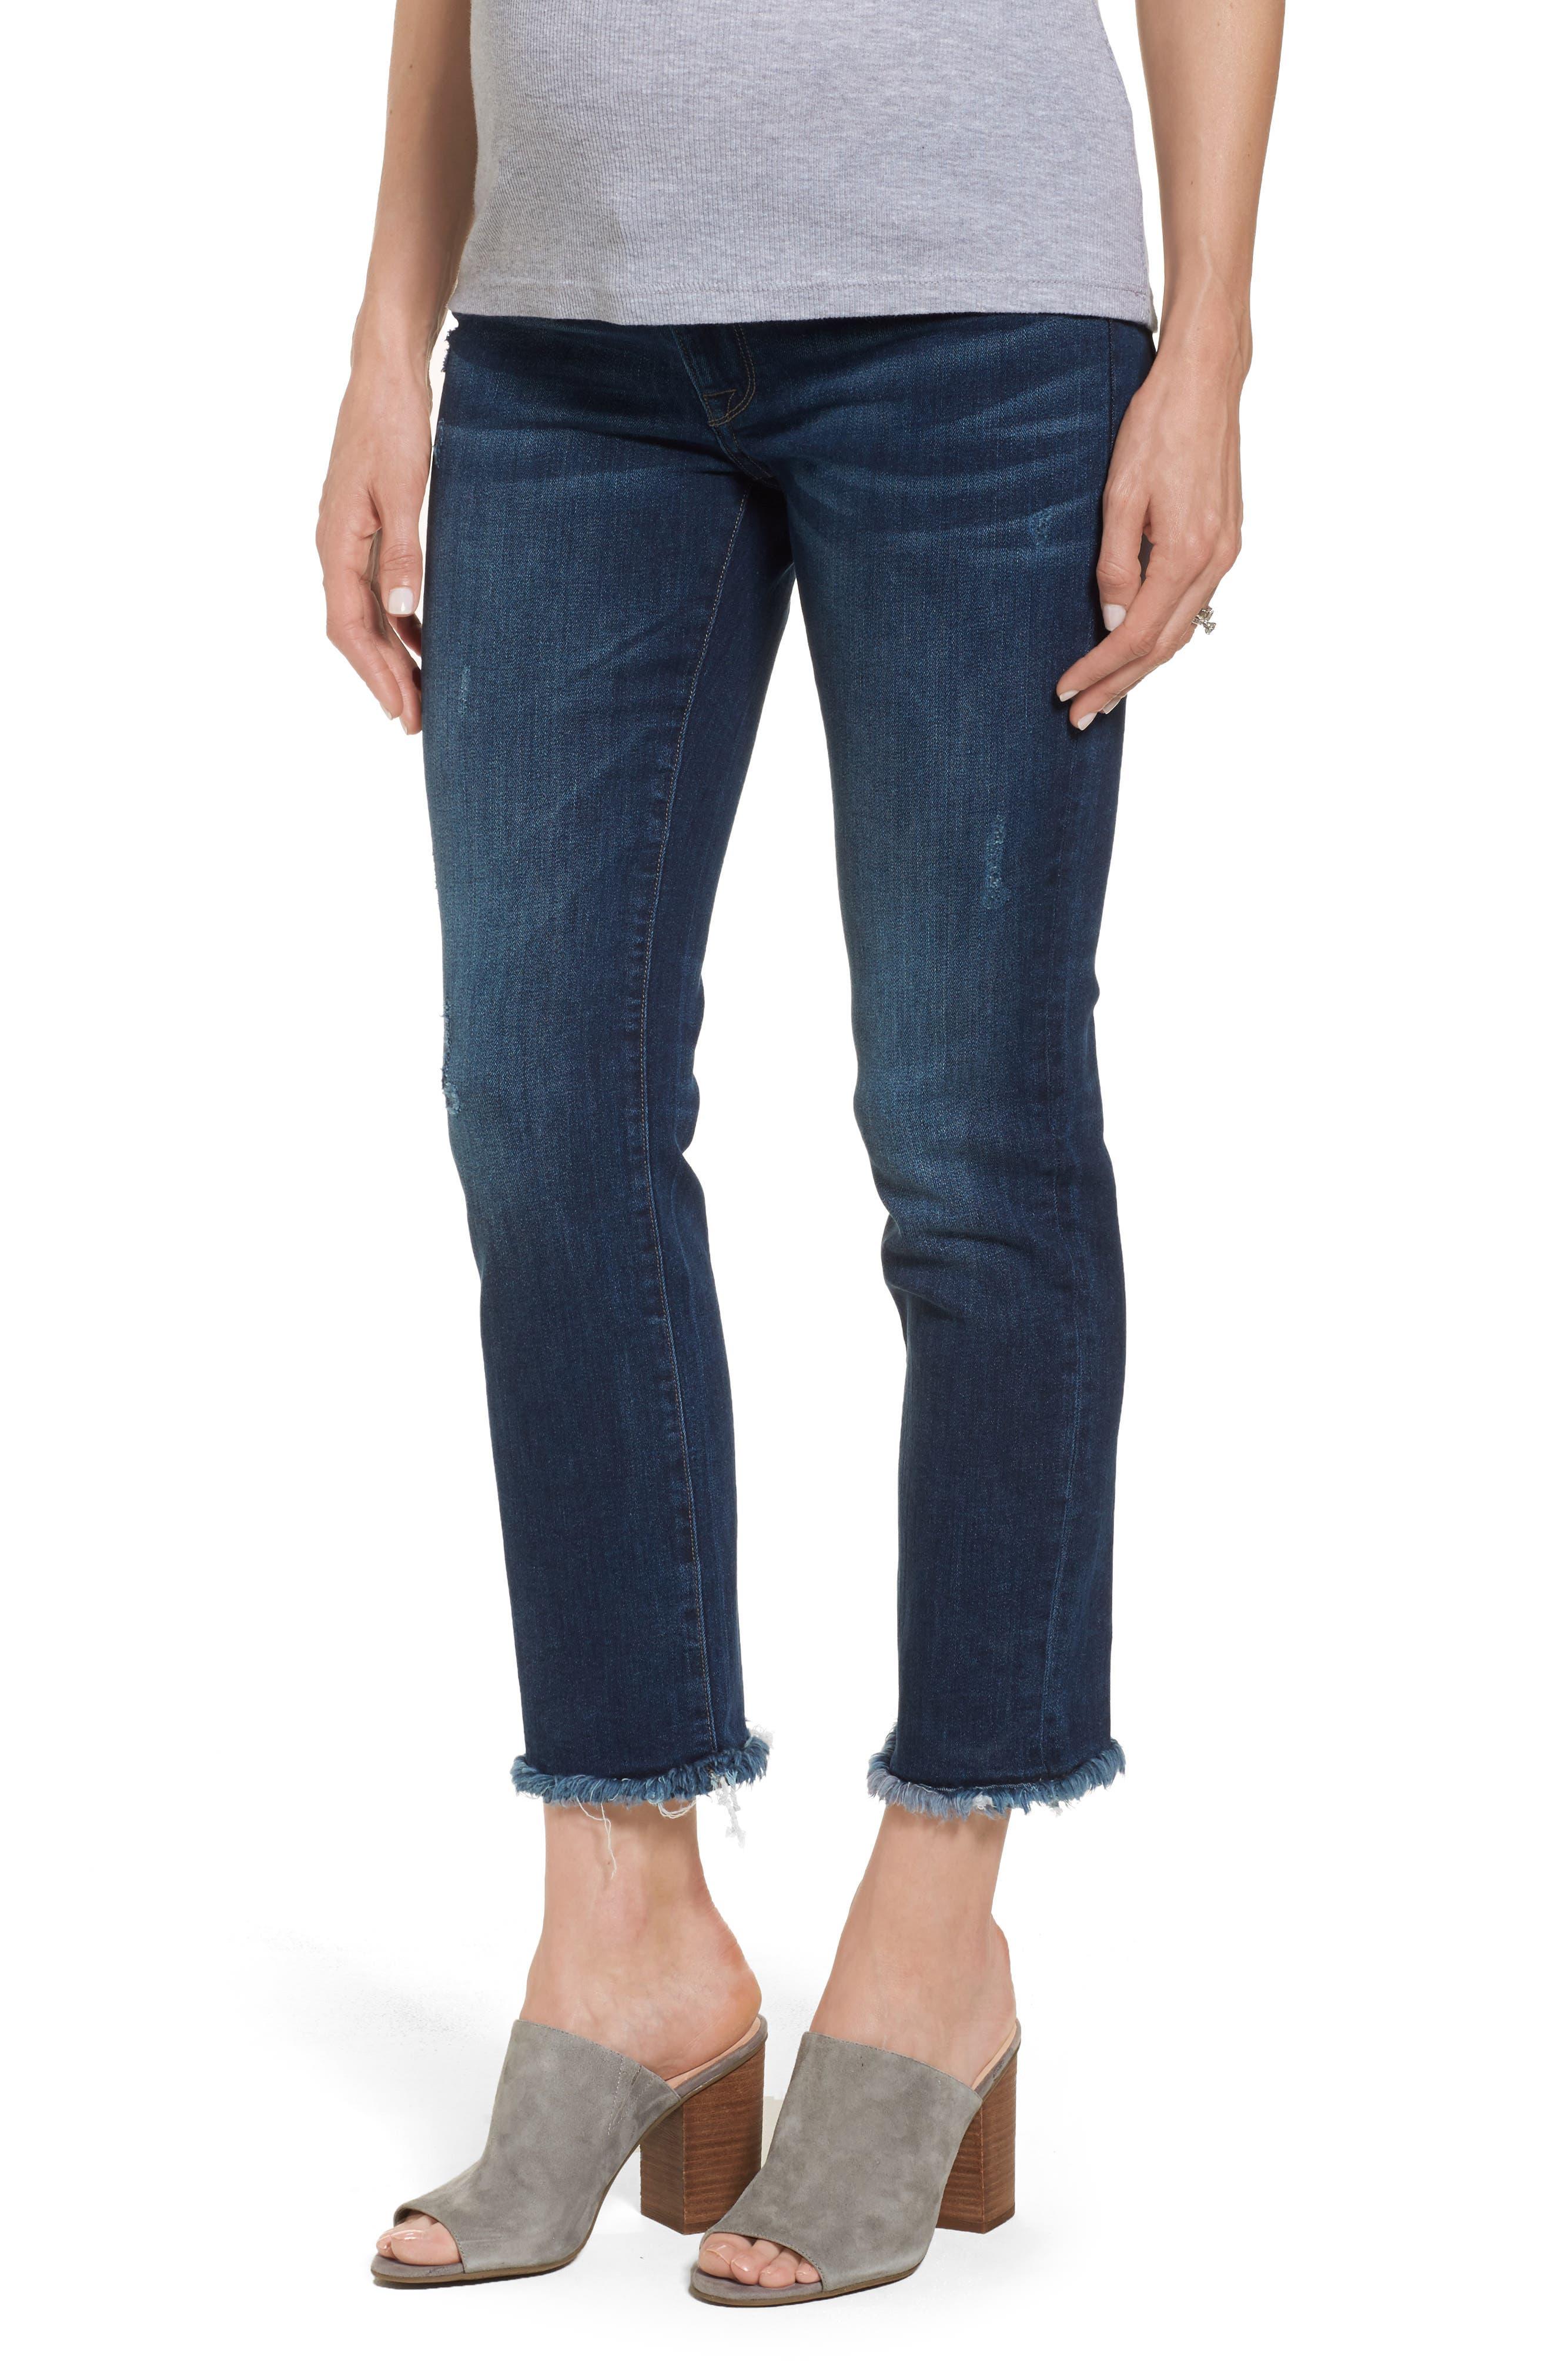 Mara Maternity Ankle Jeans,                             Main thumbnail 1, color,                             405